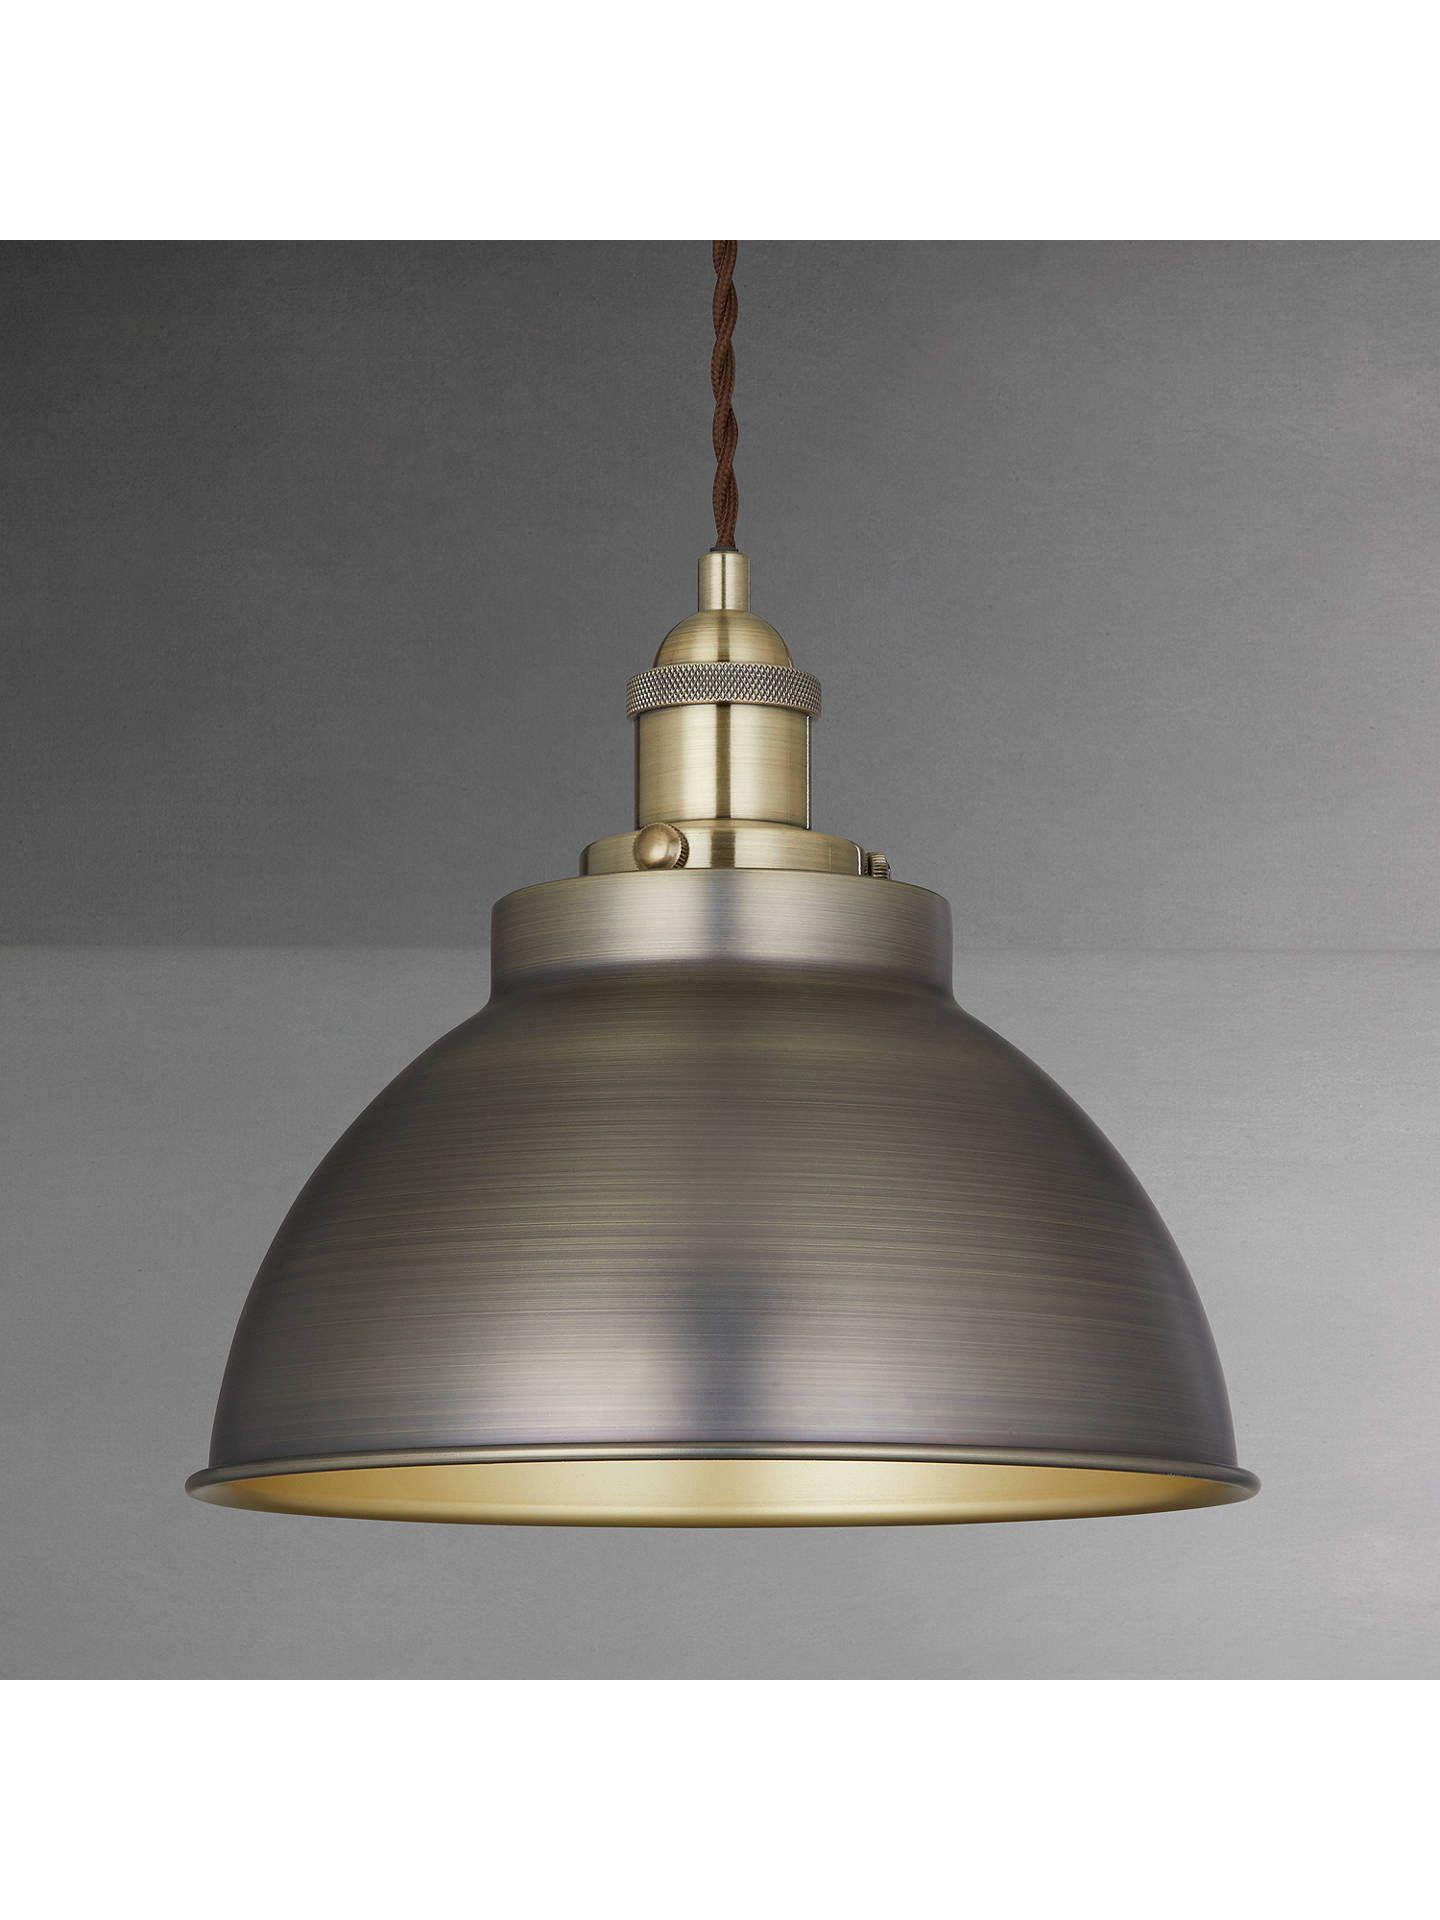 d7f10cb85ad4 BuyJohn Lewis & Partners Baldwin Pendant Ceiling Light, Antique Brass  Online at johnlewis.com